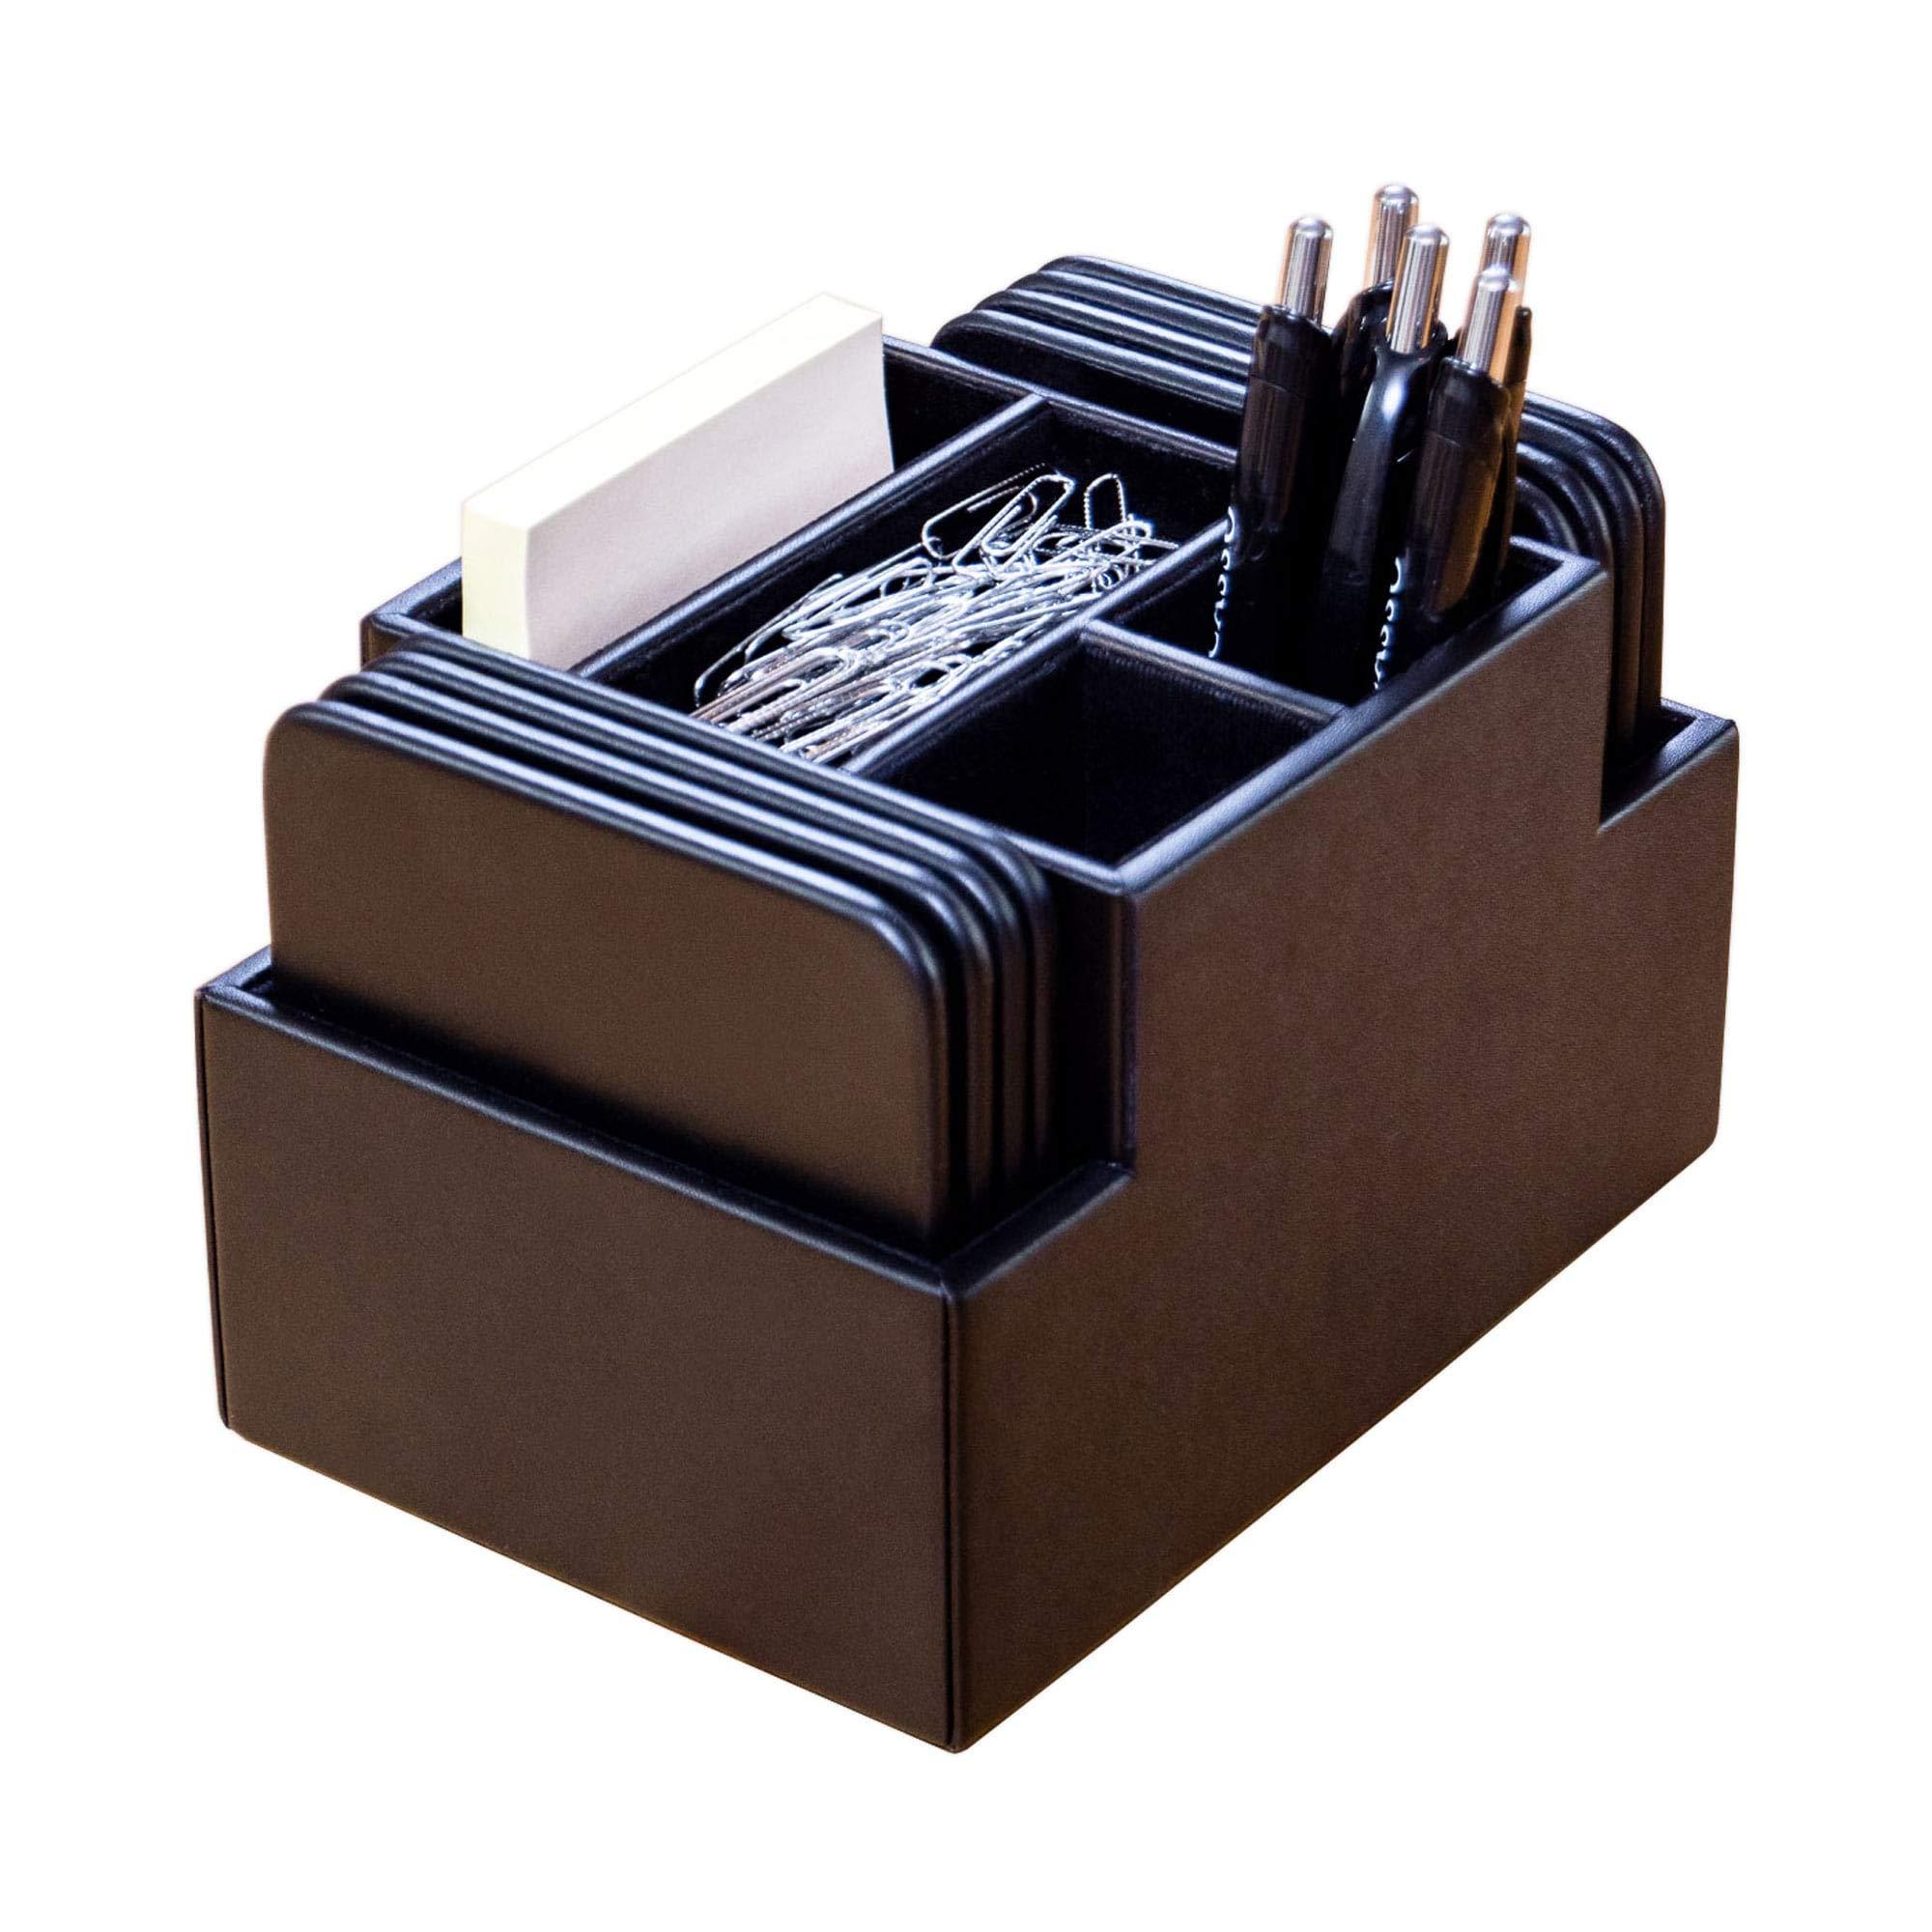 Dacasso Desk Organizer, 6.8125 x 4.8125 x 4.375, Black